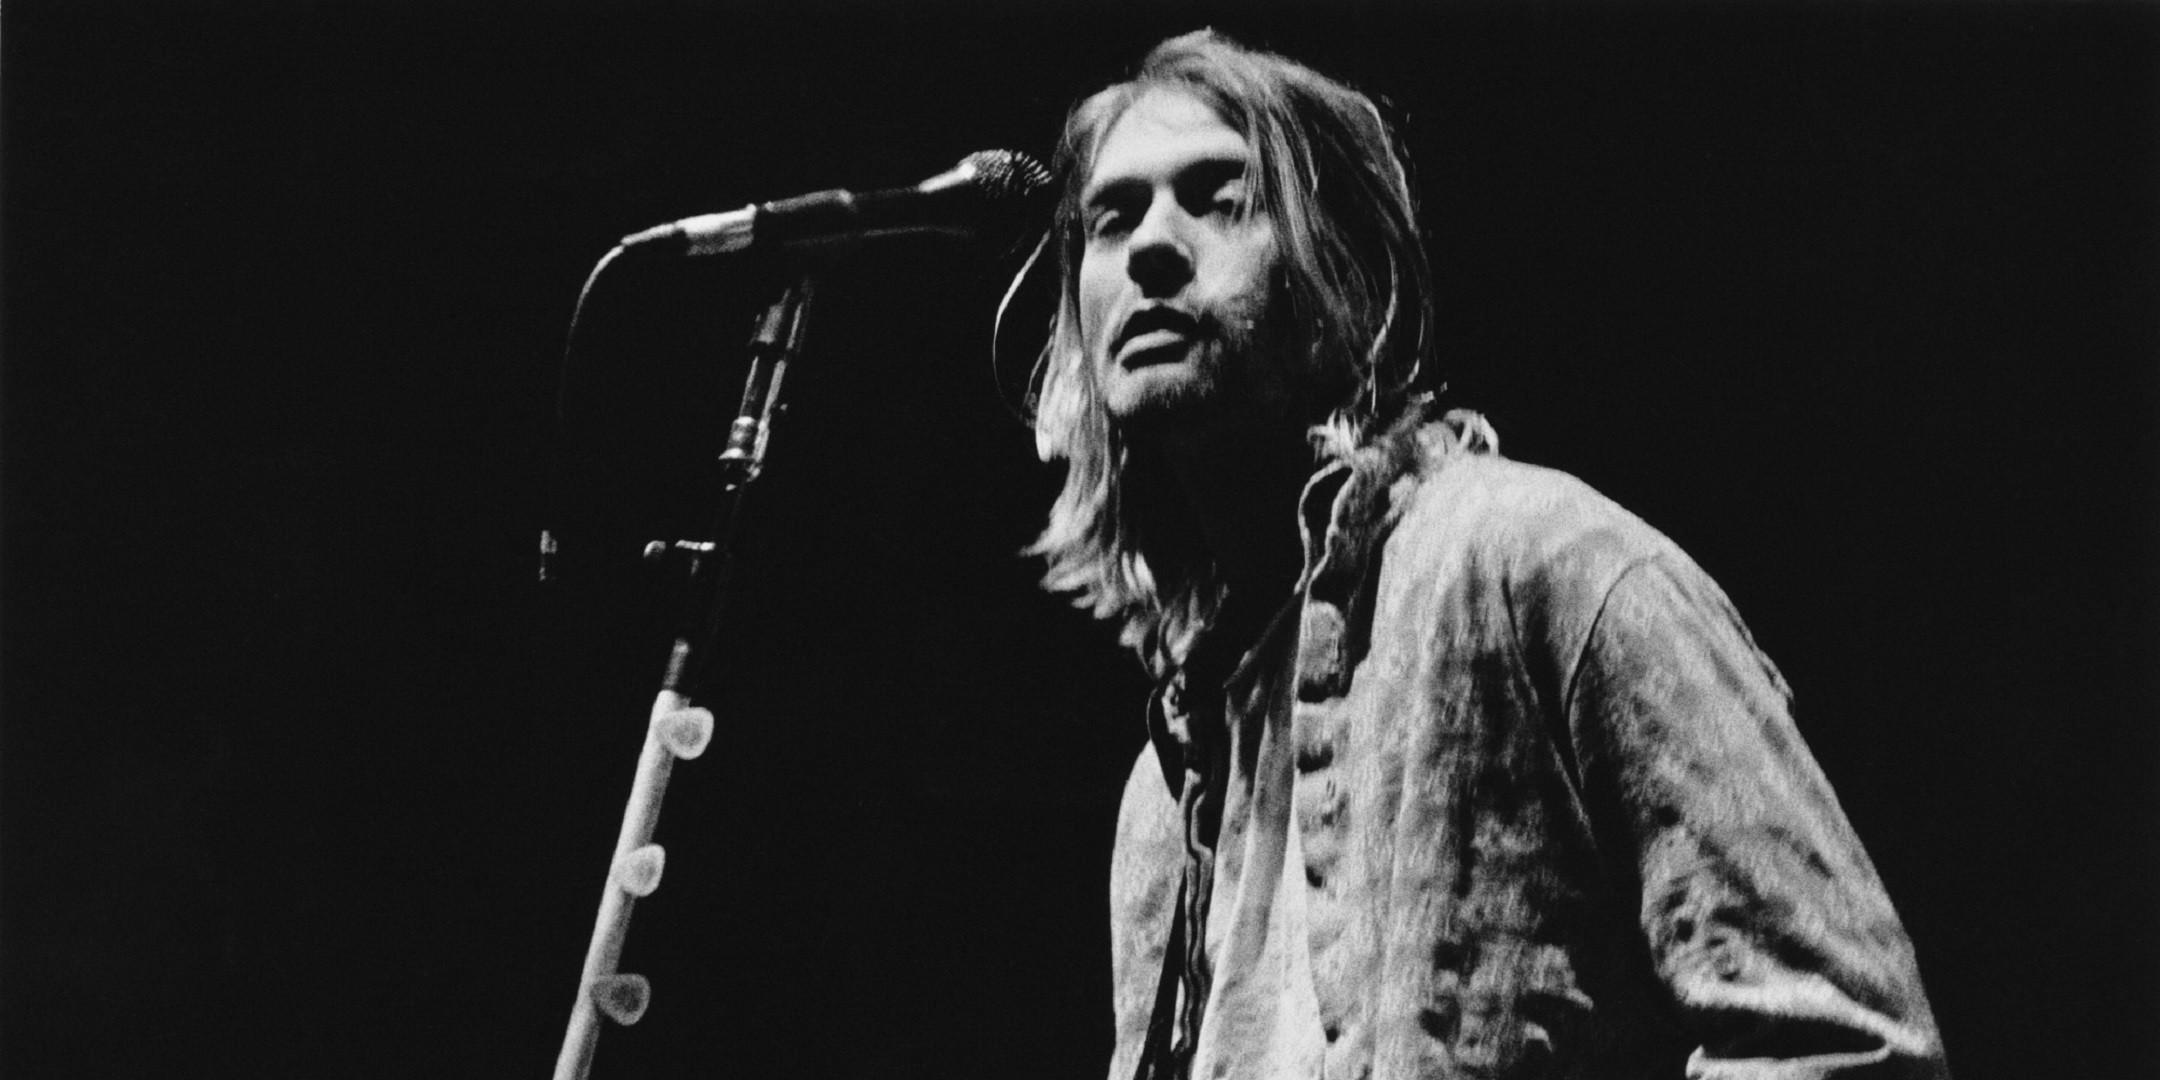 Kurt cobain background 63 pictures - Kurt cobain nirvana wallpaper ...